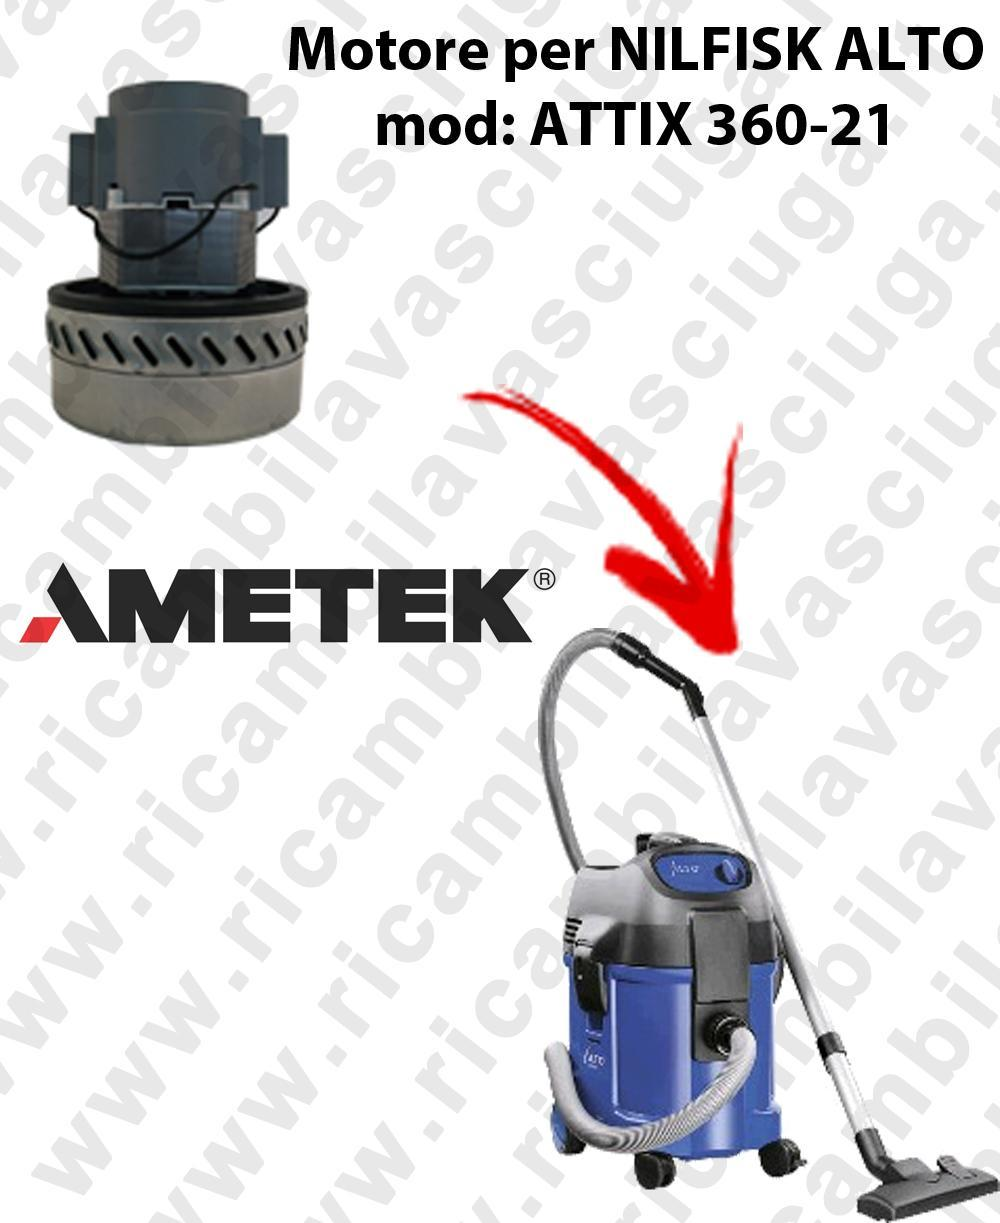 ATTIX 360-21 Ametek Vacuum Motor for vacuum cleaner NILFISK ALTO